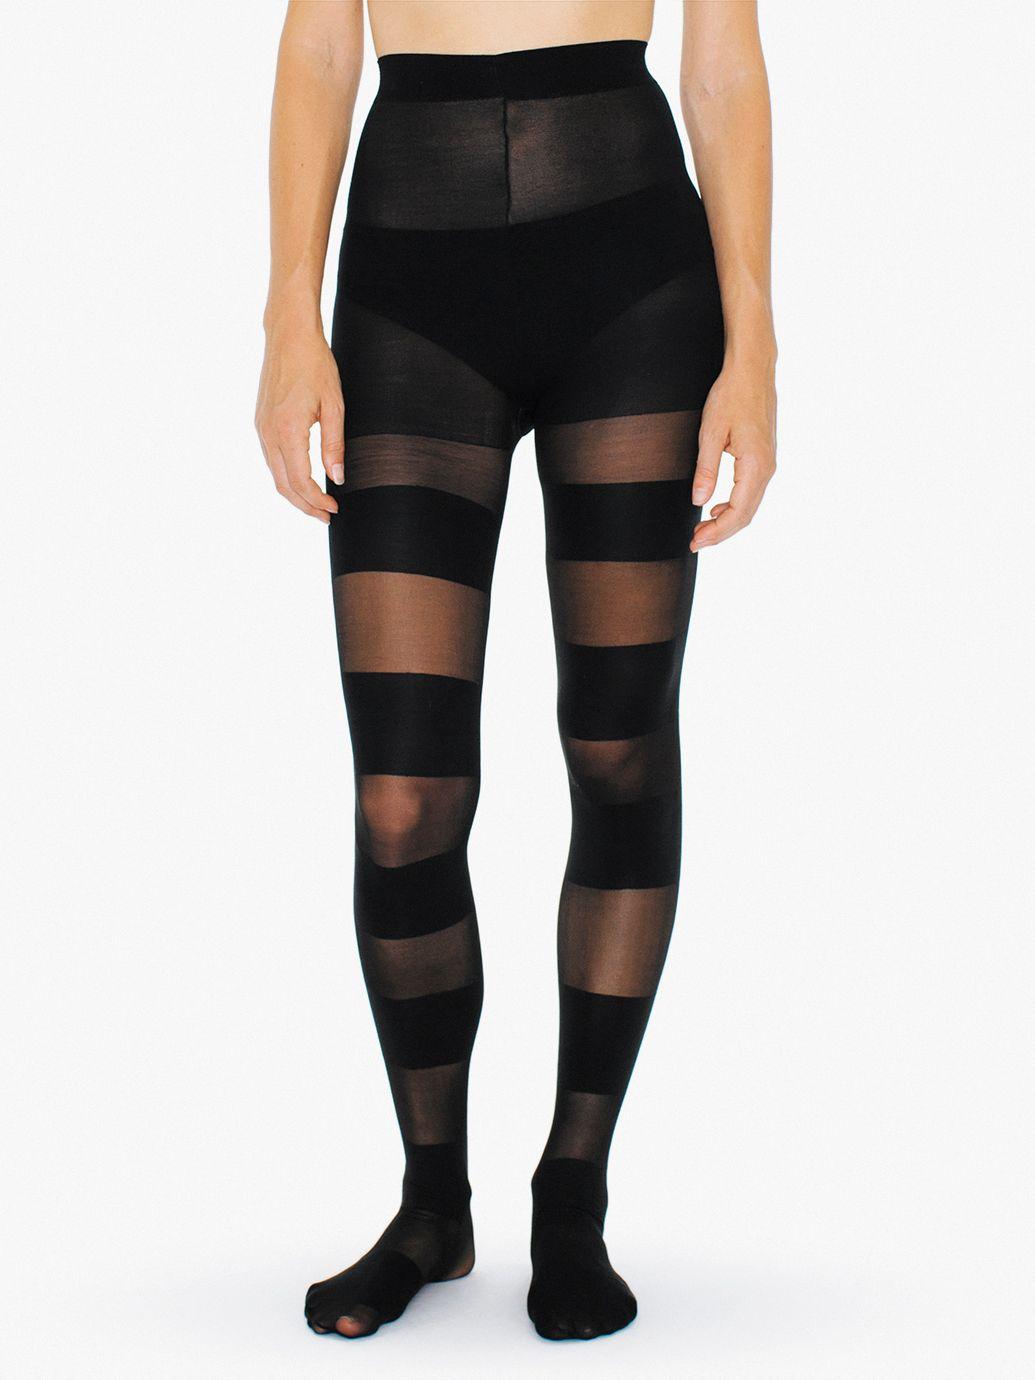 Pantyhose with socks sewn on